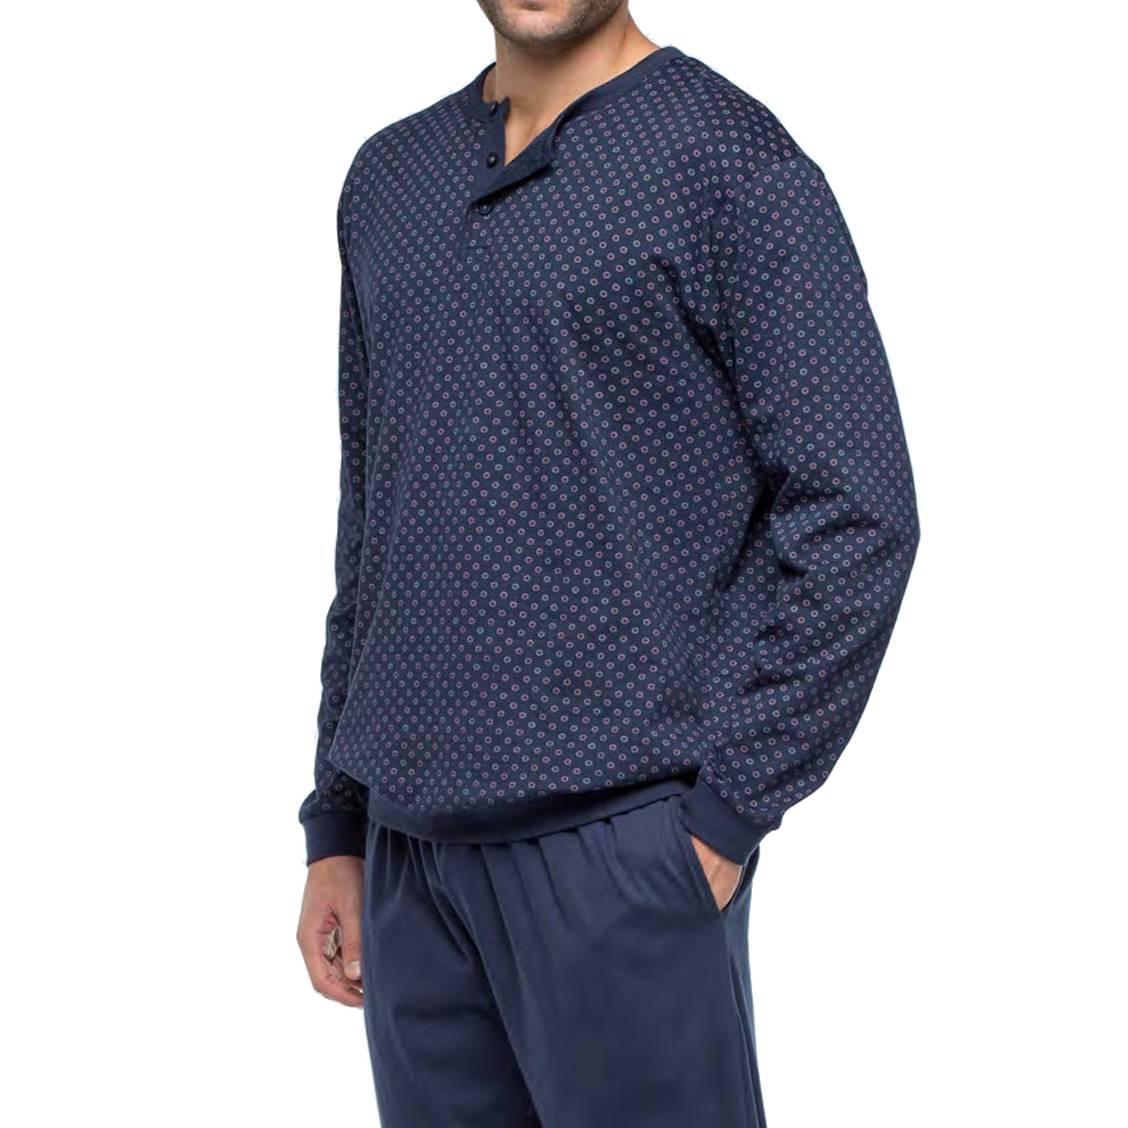 Pyjama long Guasch en coton forme jogging : sweat col tunisien bleu marine à motifs et pantalon bleu marine